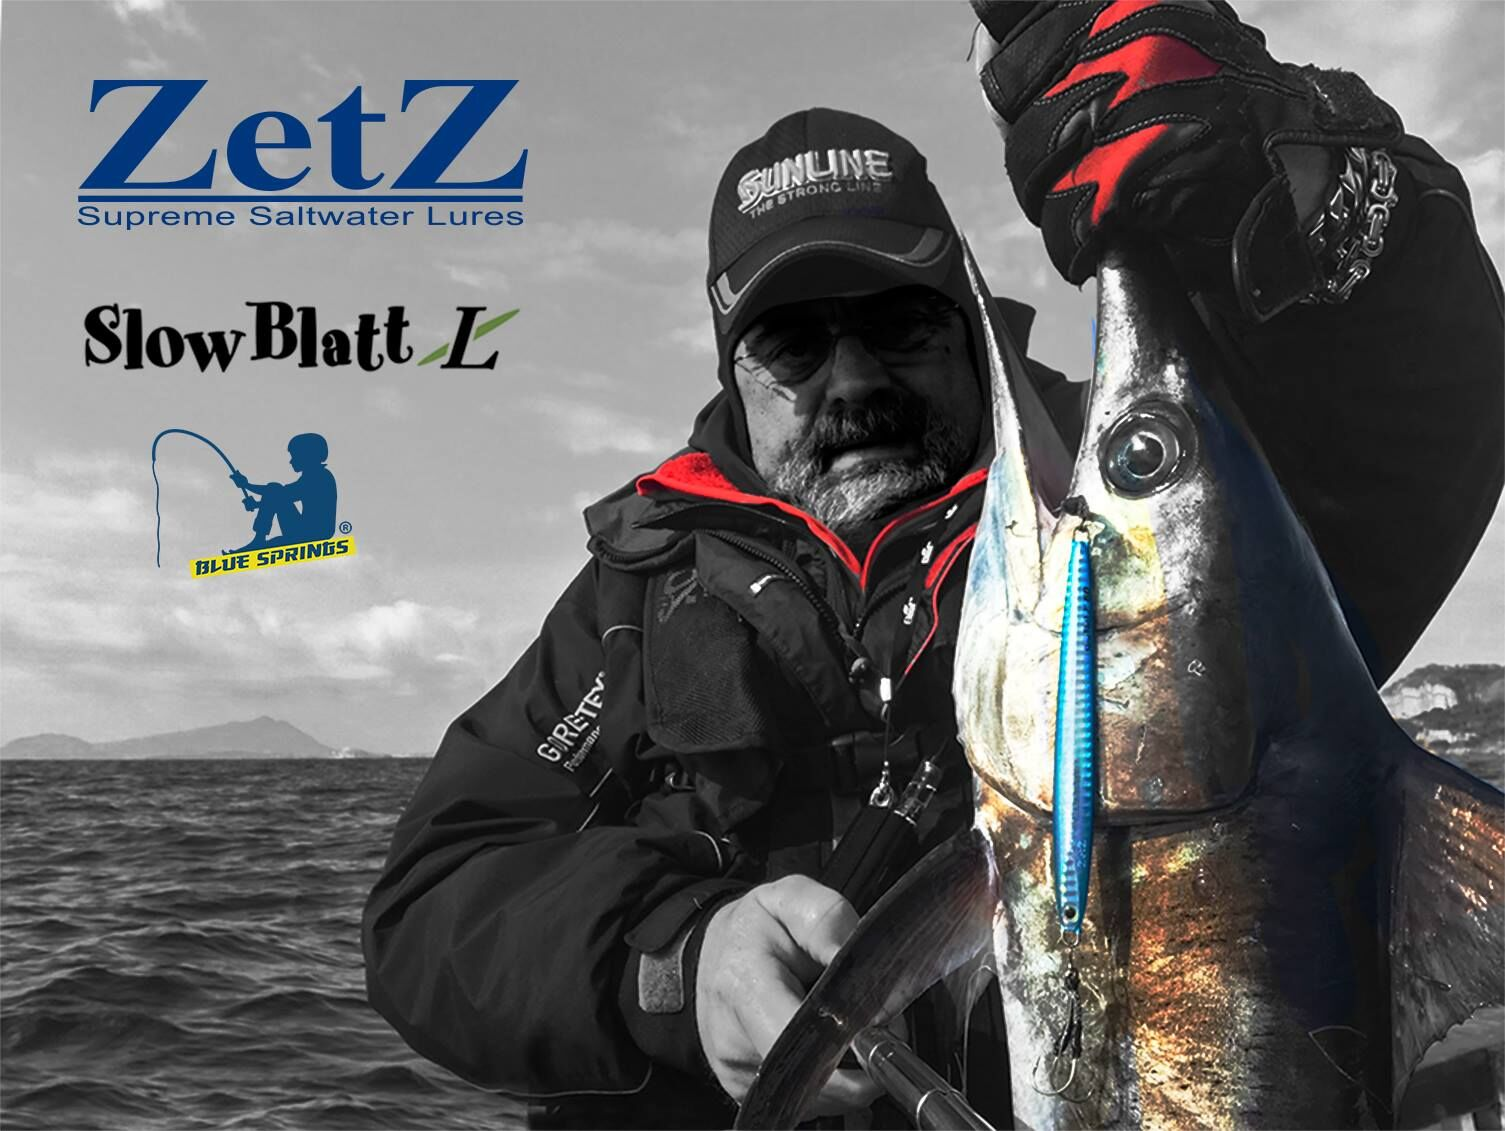 Zetz slow blatt